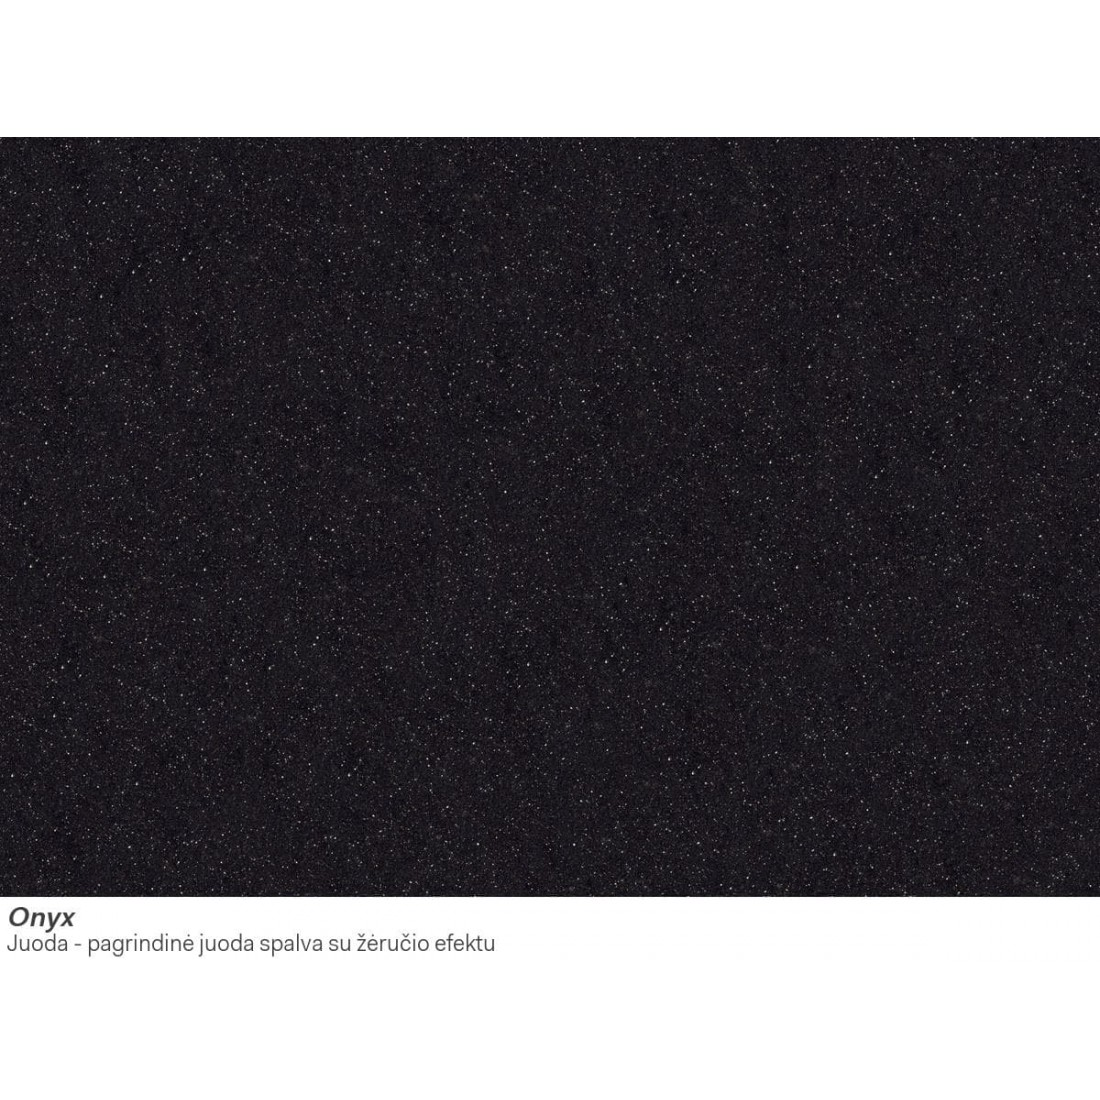 Akmens masės plautuvė Franke Maris MRG 611-100 XL, Onyx